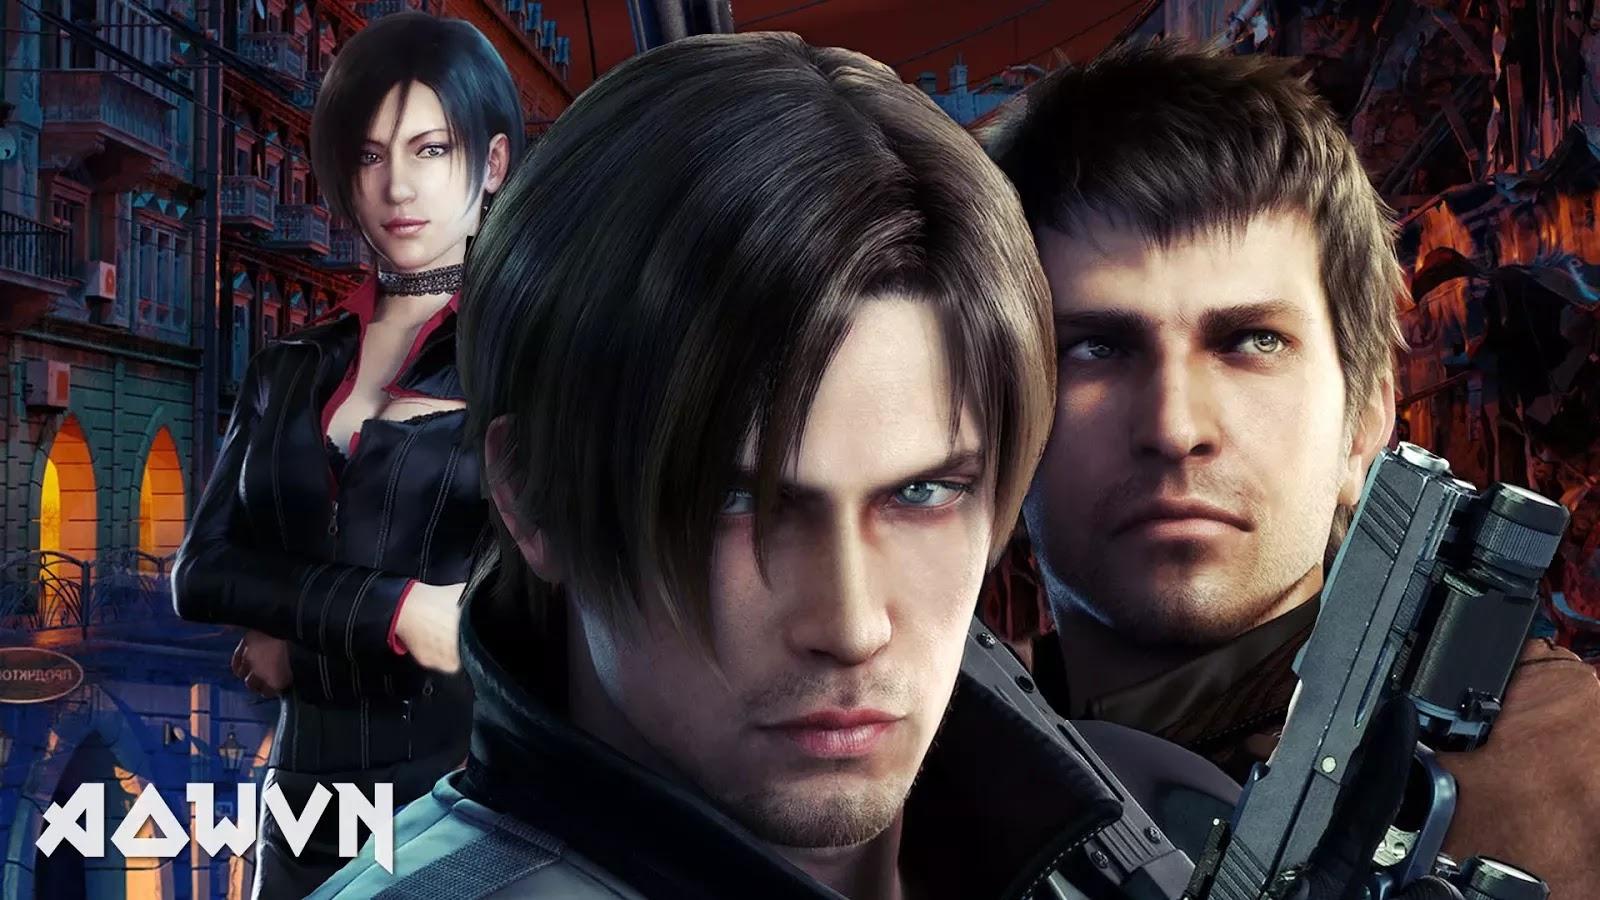 resident evil damnation aowvn.org min - [ Phim 3gp Mp4 ] Trọn Bộ Resident Evil: Degeneration + Damnation + Vendette | Vietsub - Cực Hay